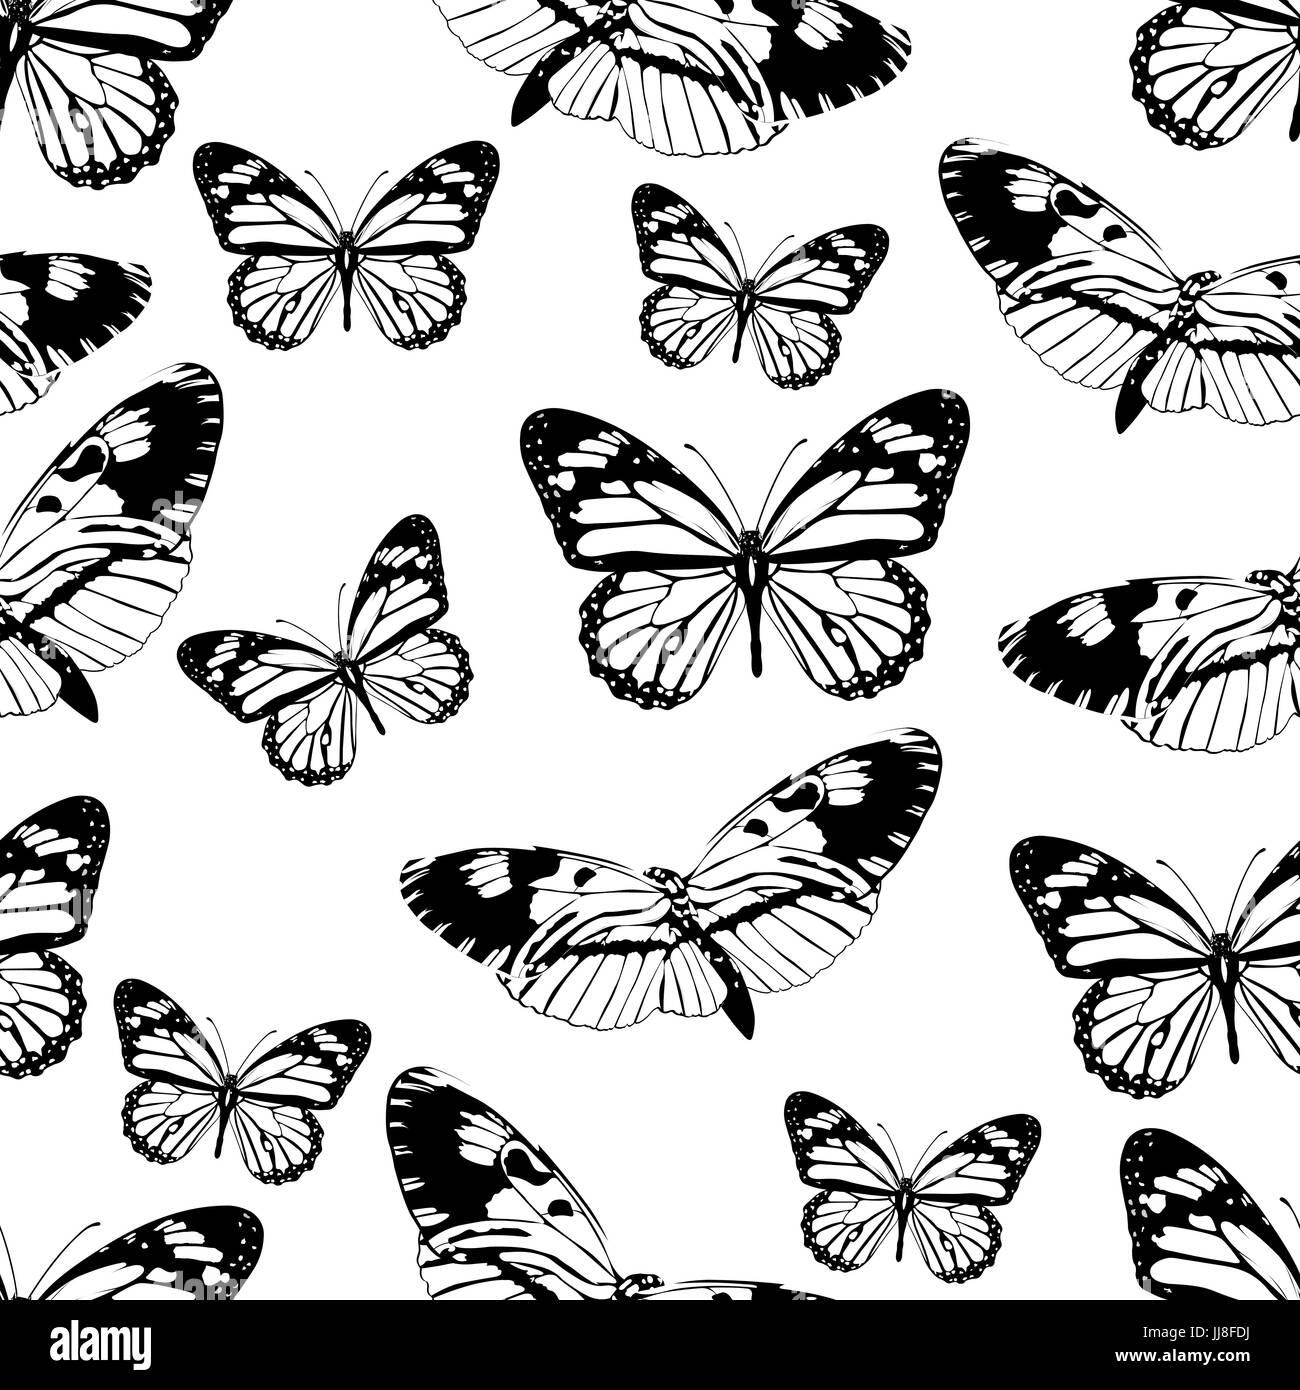 Natural Winged Vector Vectors Immagini Natural Winged Vector